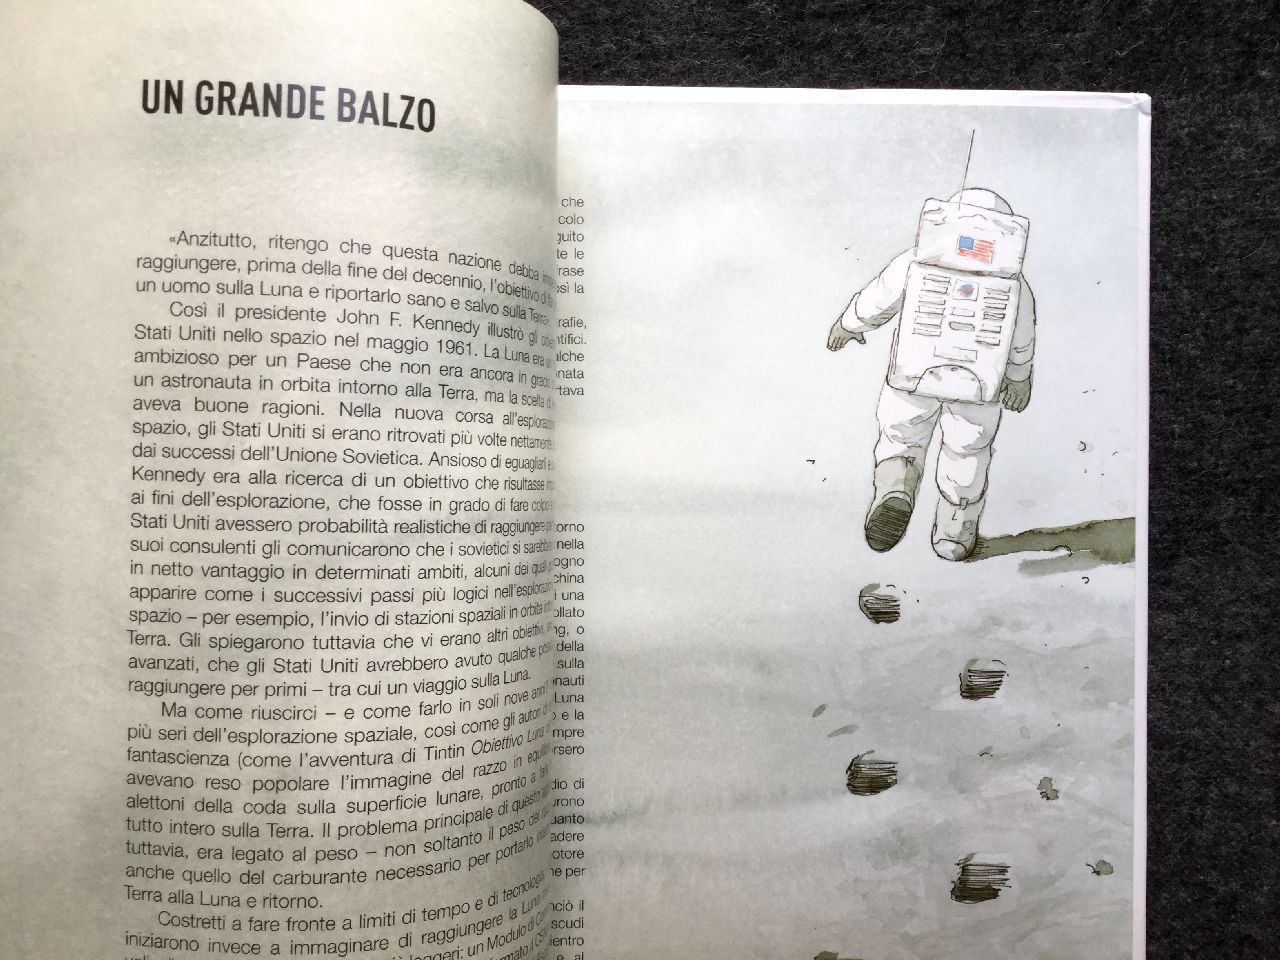 Brian Floca, L'uomo sulla luna, Jaca Book